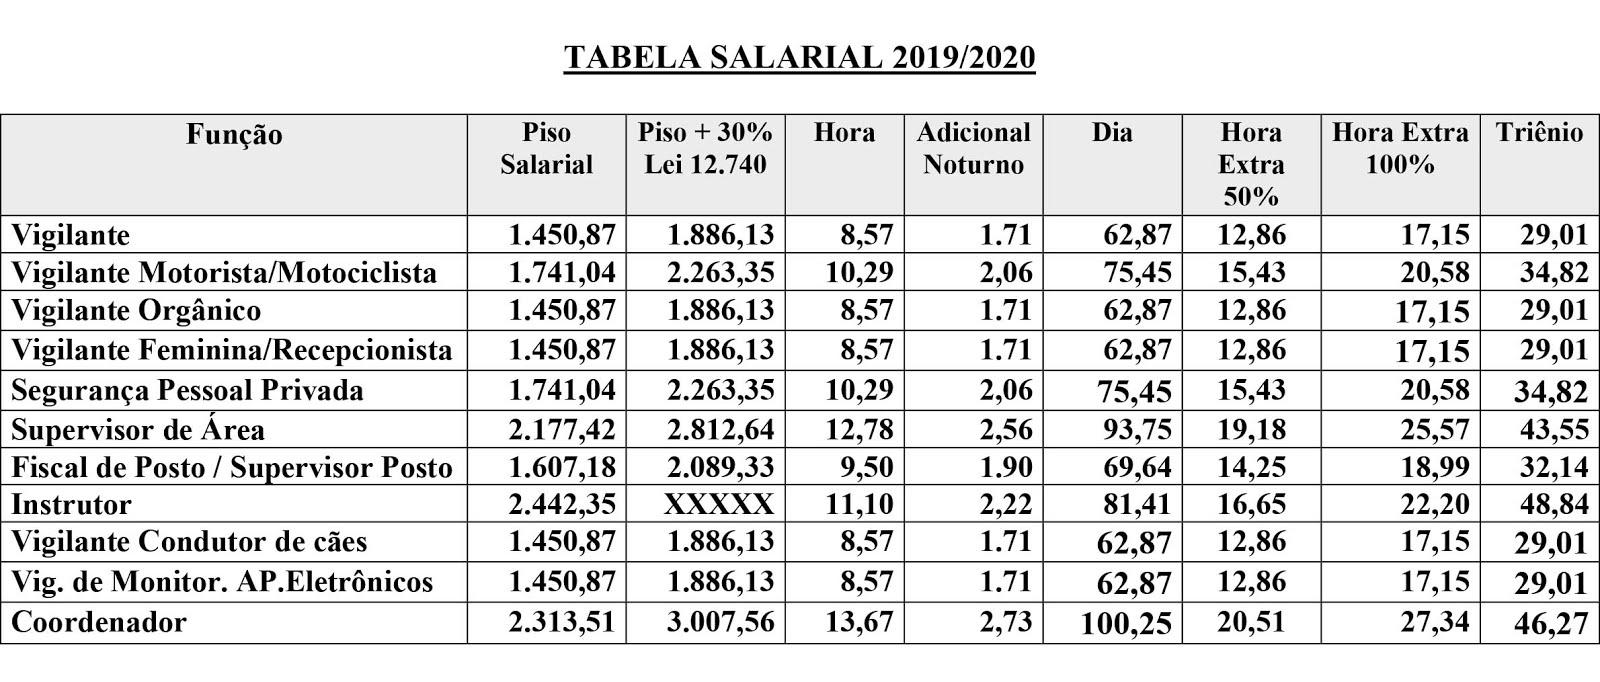 Nova tabela salarial 2019/2020